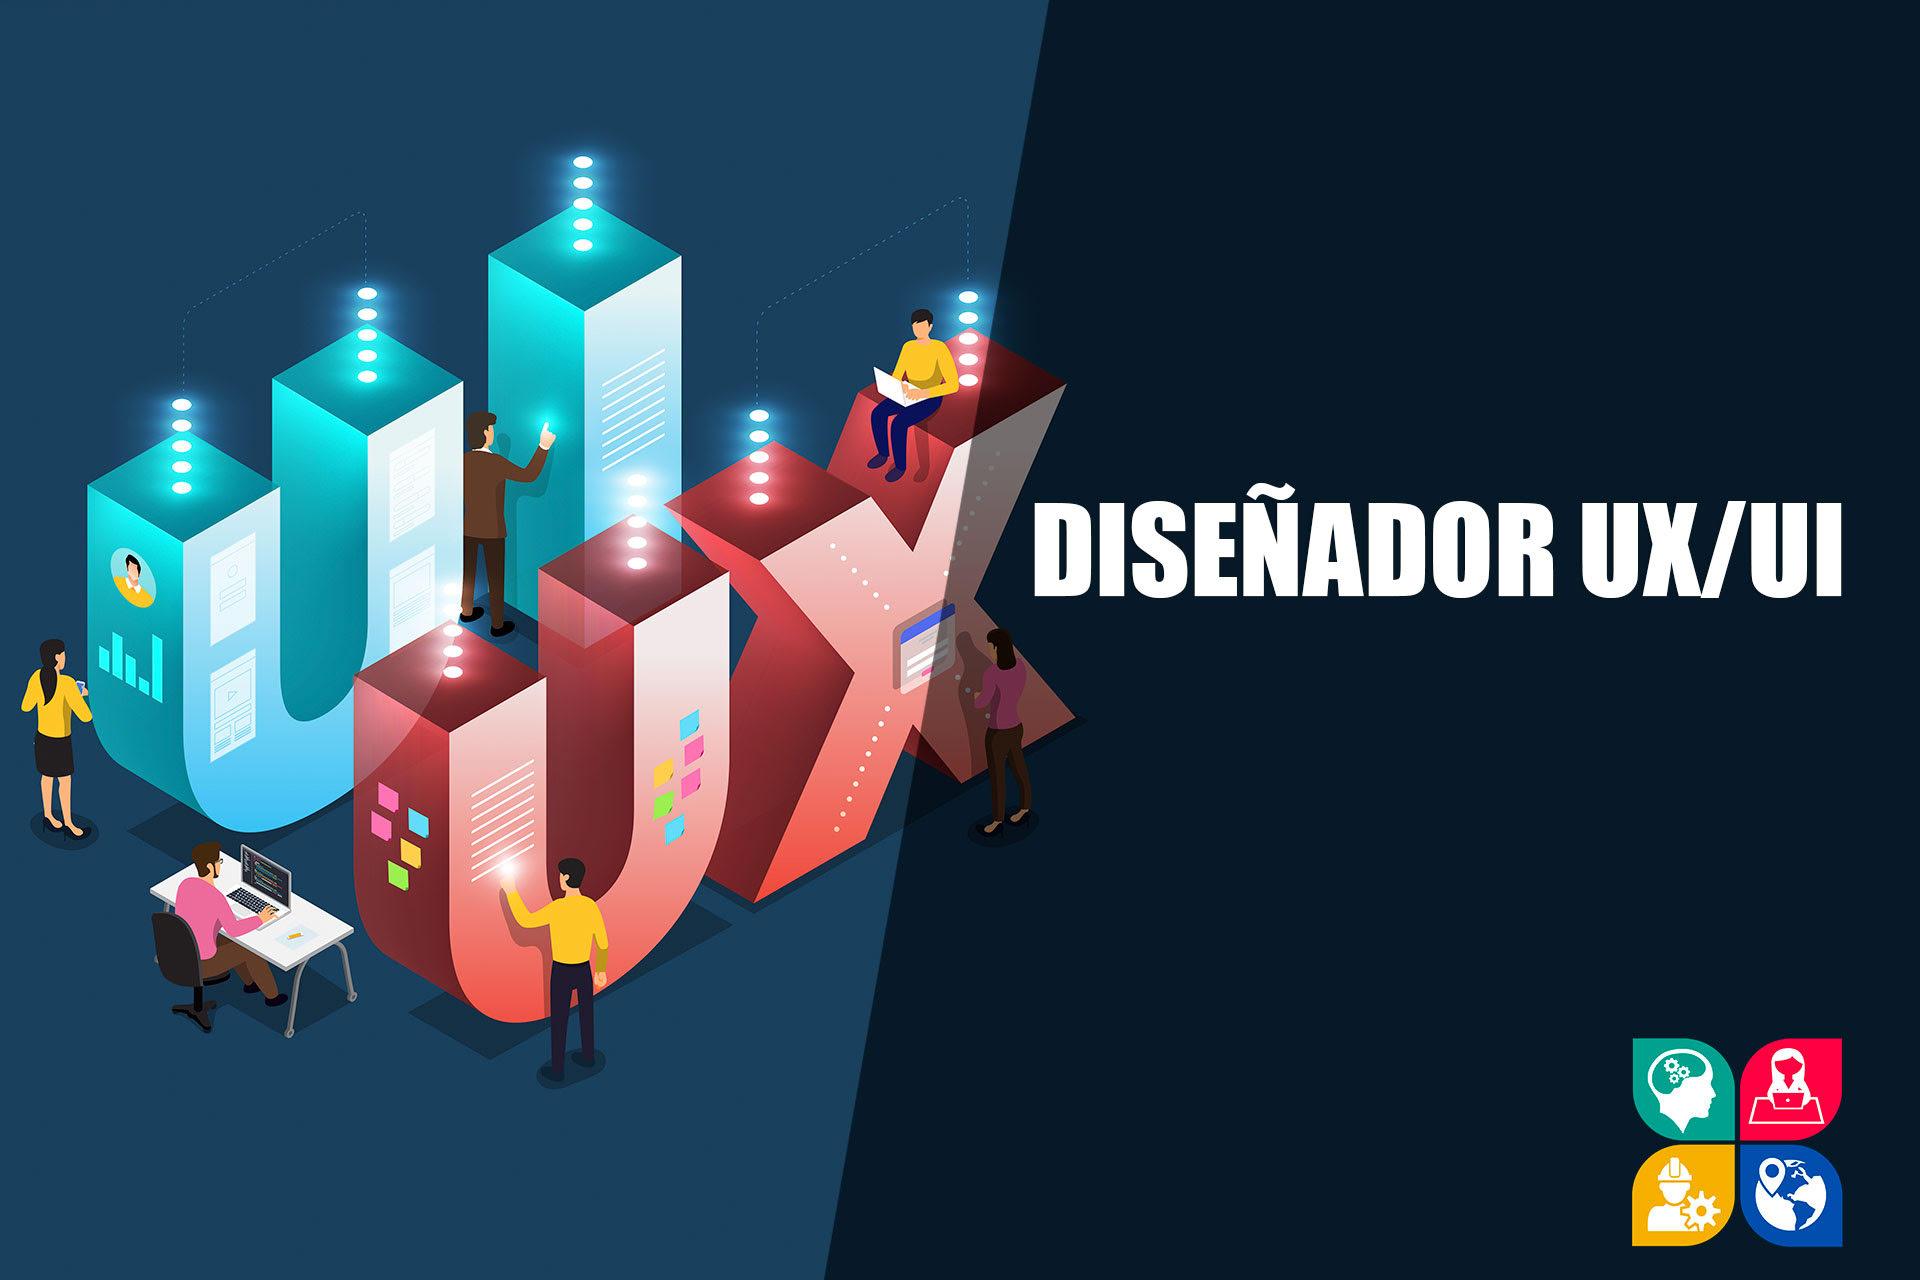 Diseñador UX/UI